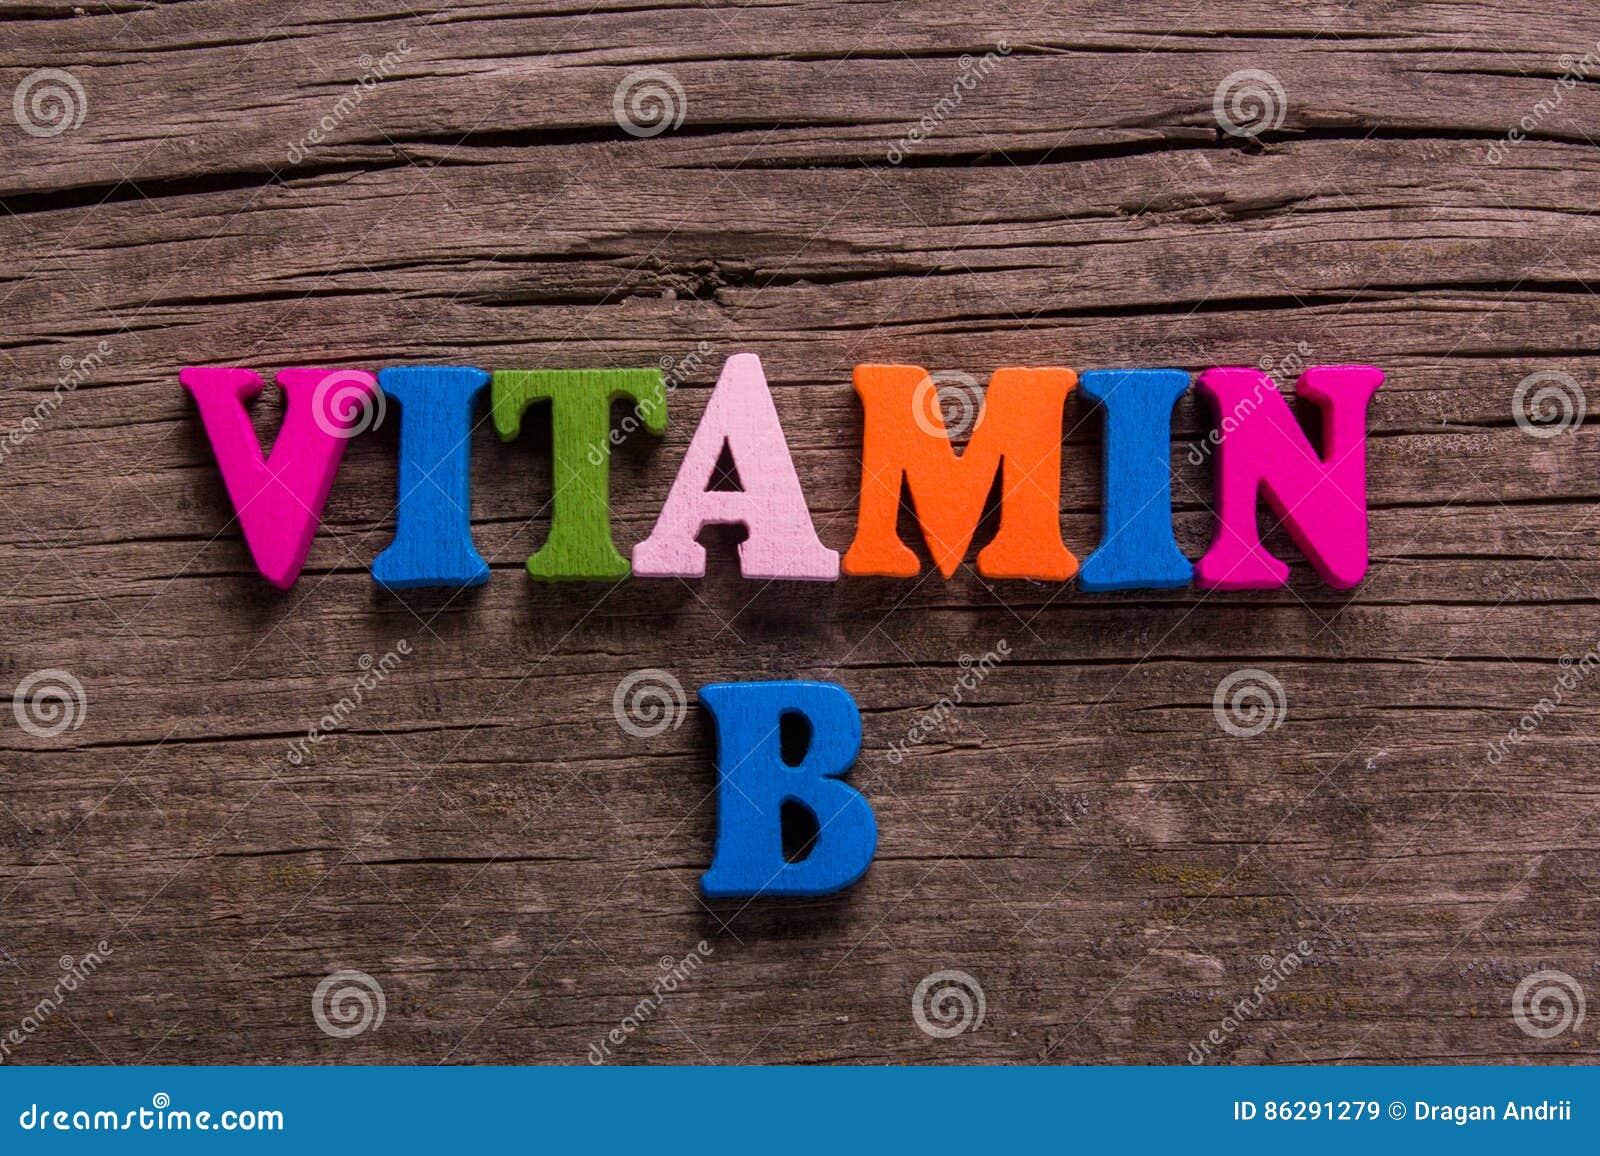 Vitamineb woord van houten brieven wordt gemaakt die